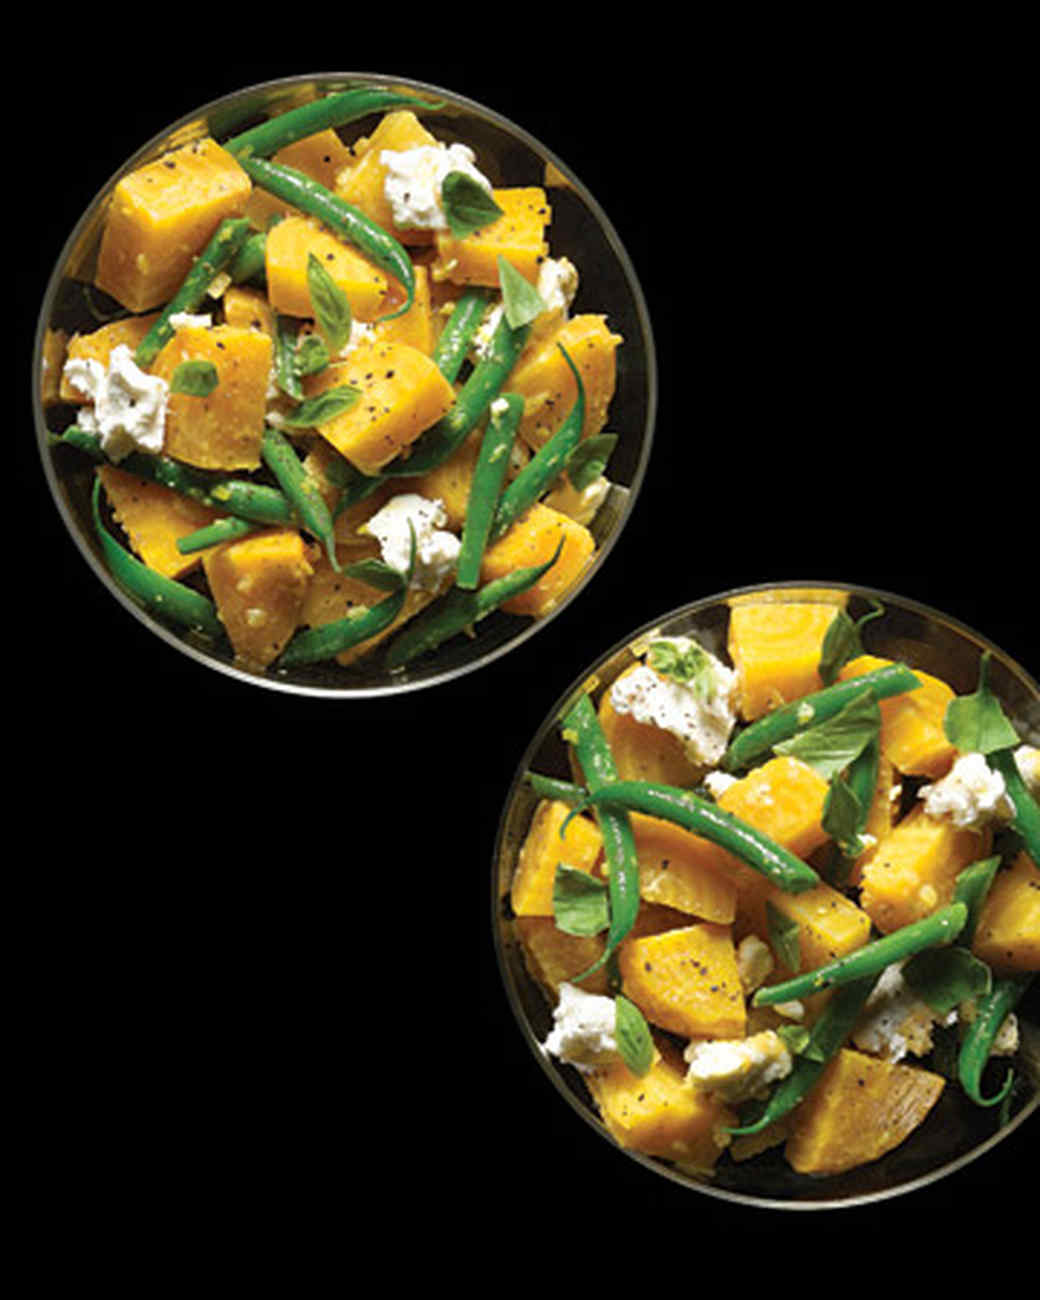 Golden-Beet Salad